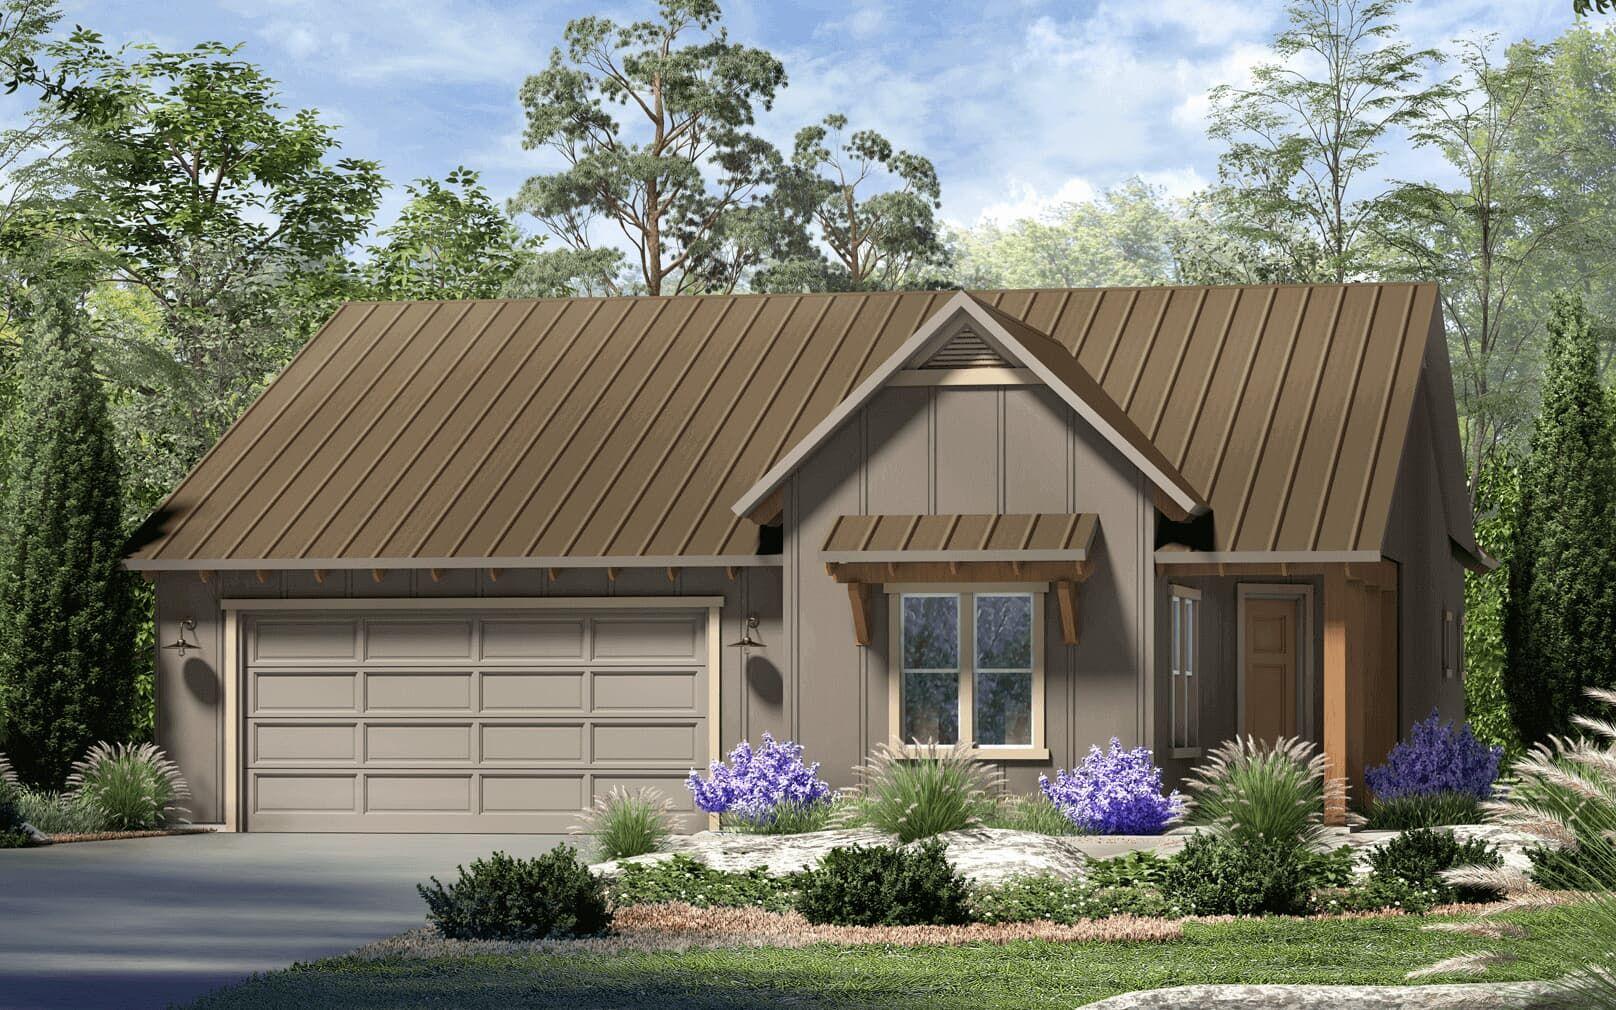 Exterior:floor plan colby modern farmhouse kissing tree san marcos texas